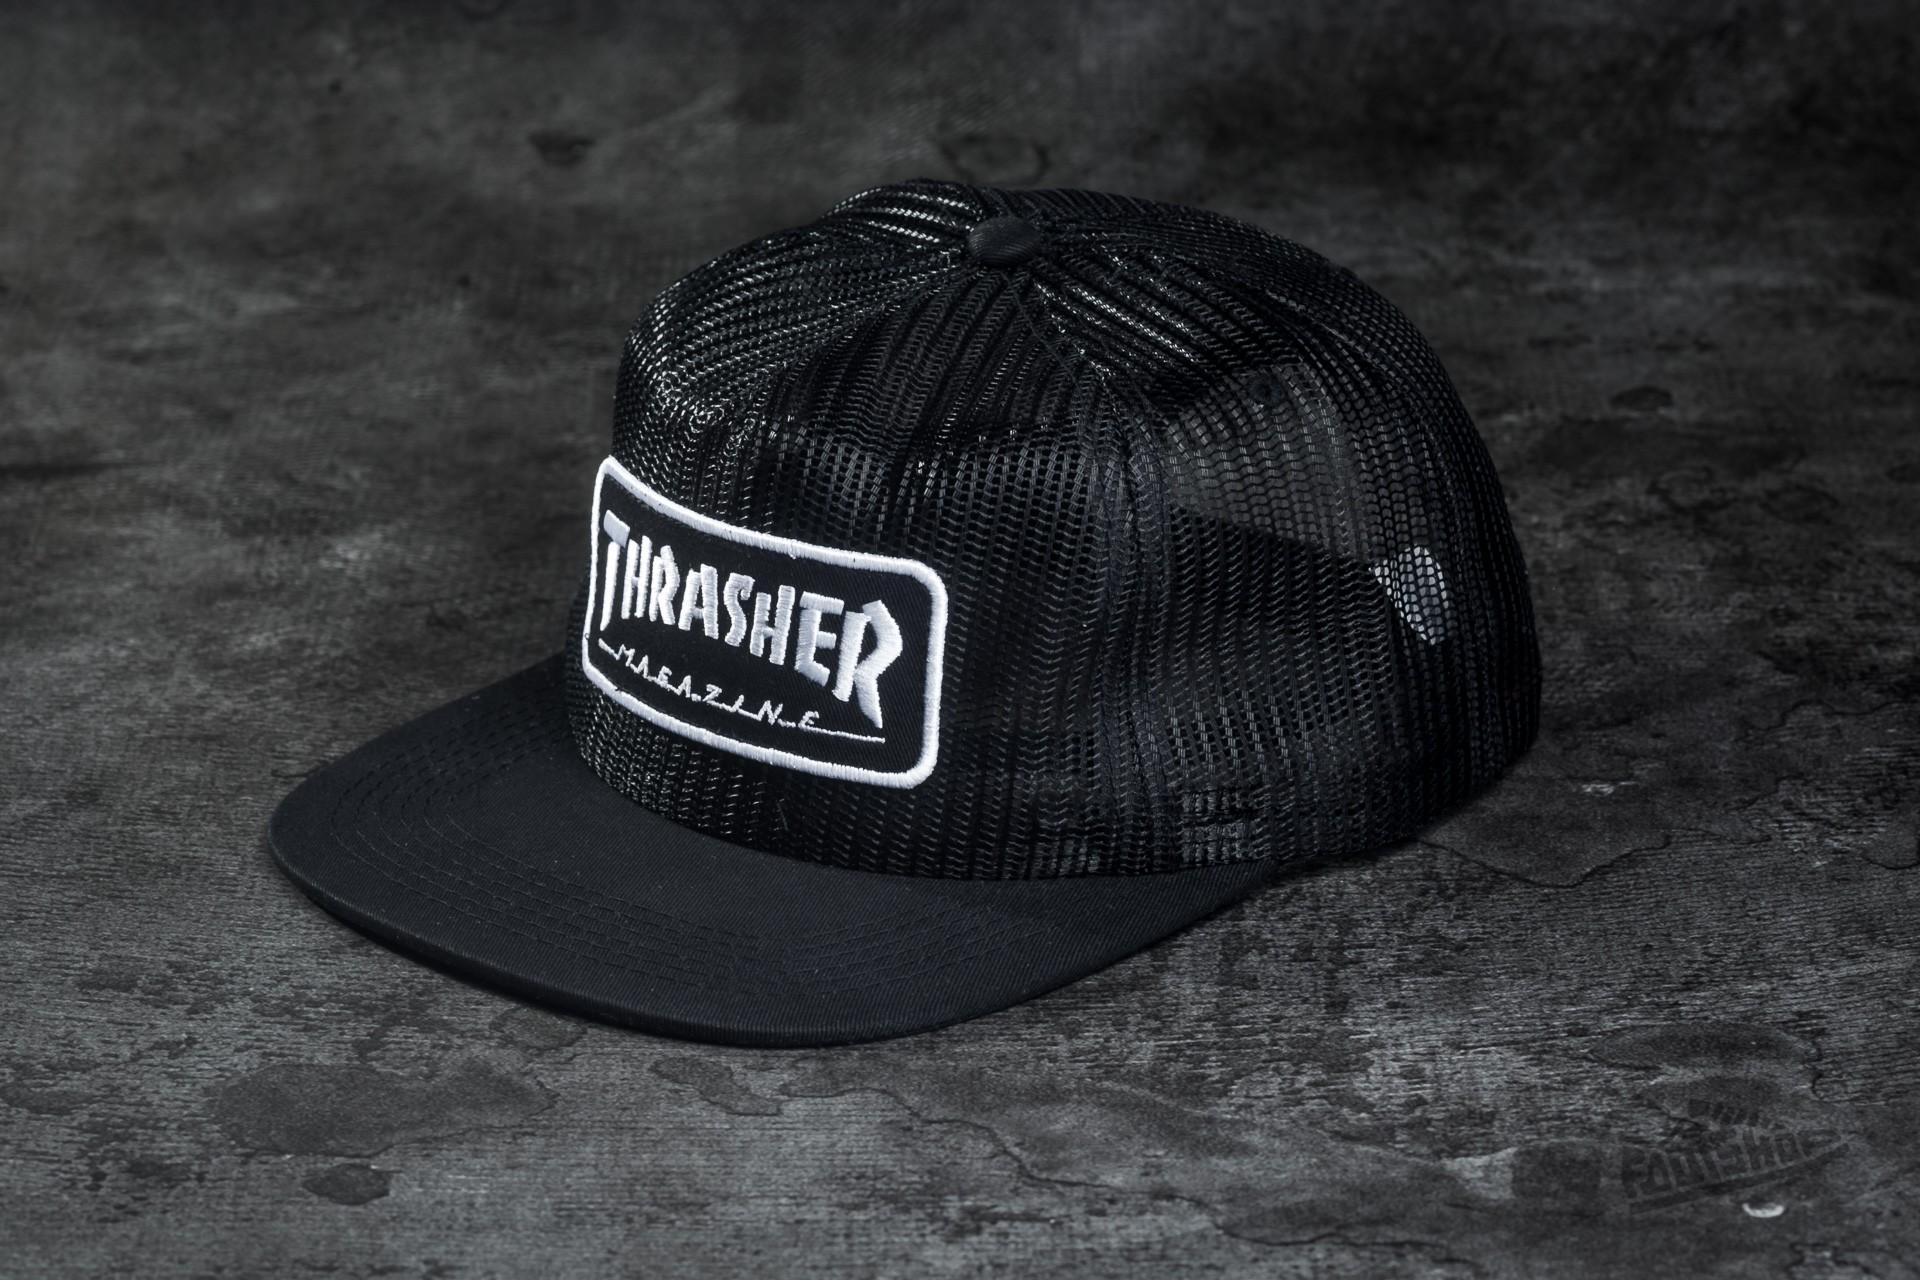 0567b3b3d27 Thrasher Magazine Logo Mesh Black  White